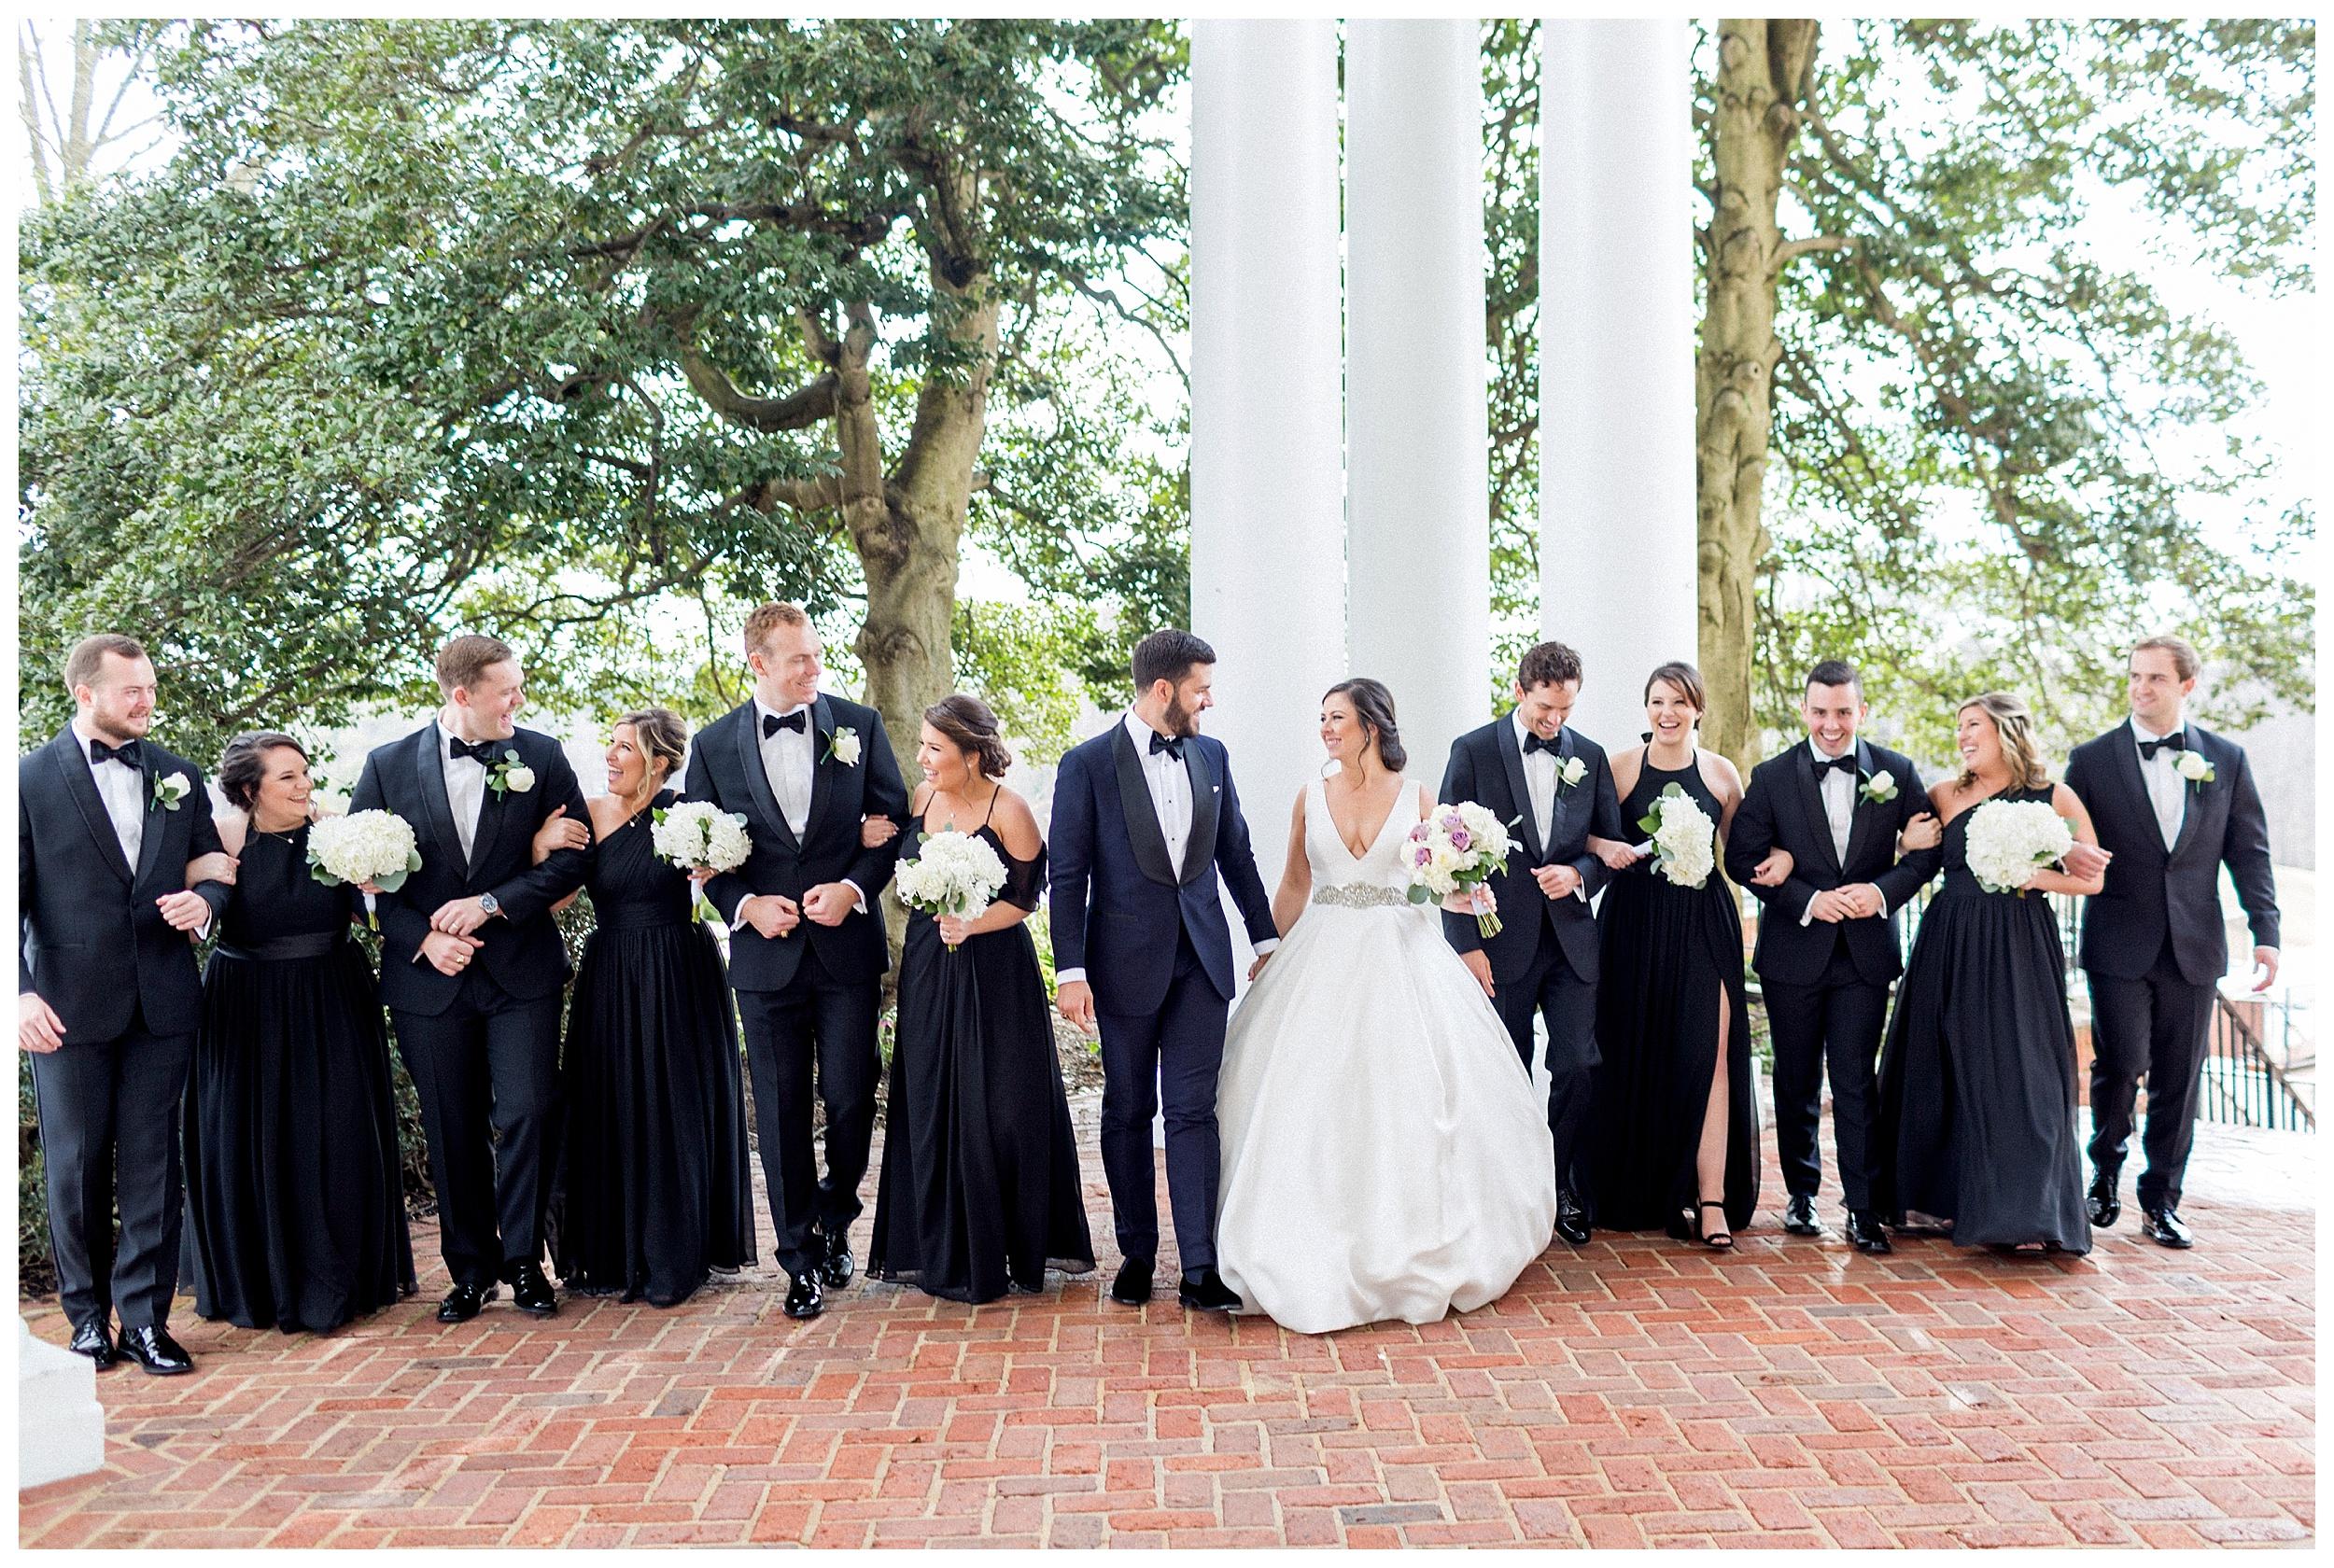 Country Club of Virginia Wedding | Richmond Wedding Photographer_0082.jpg